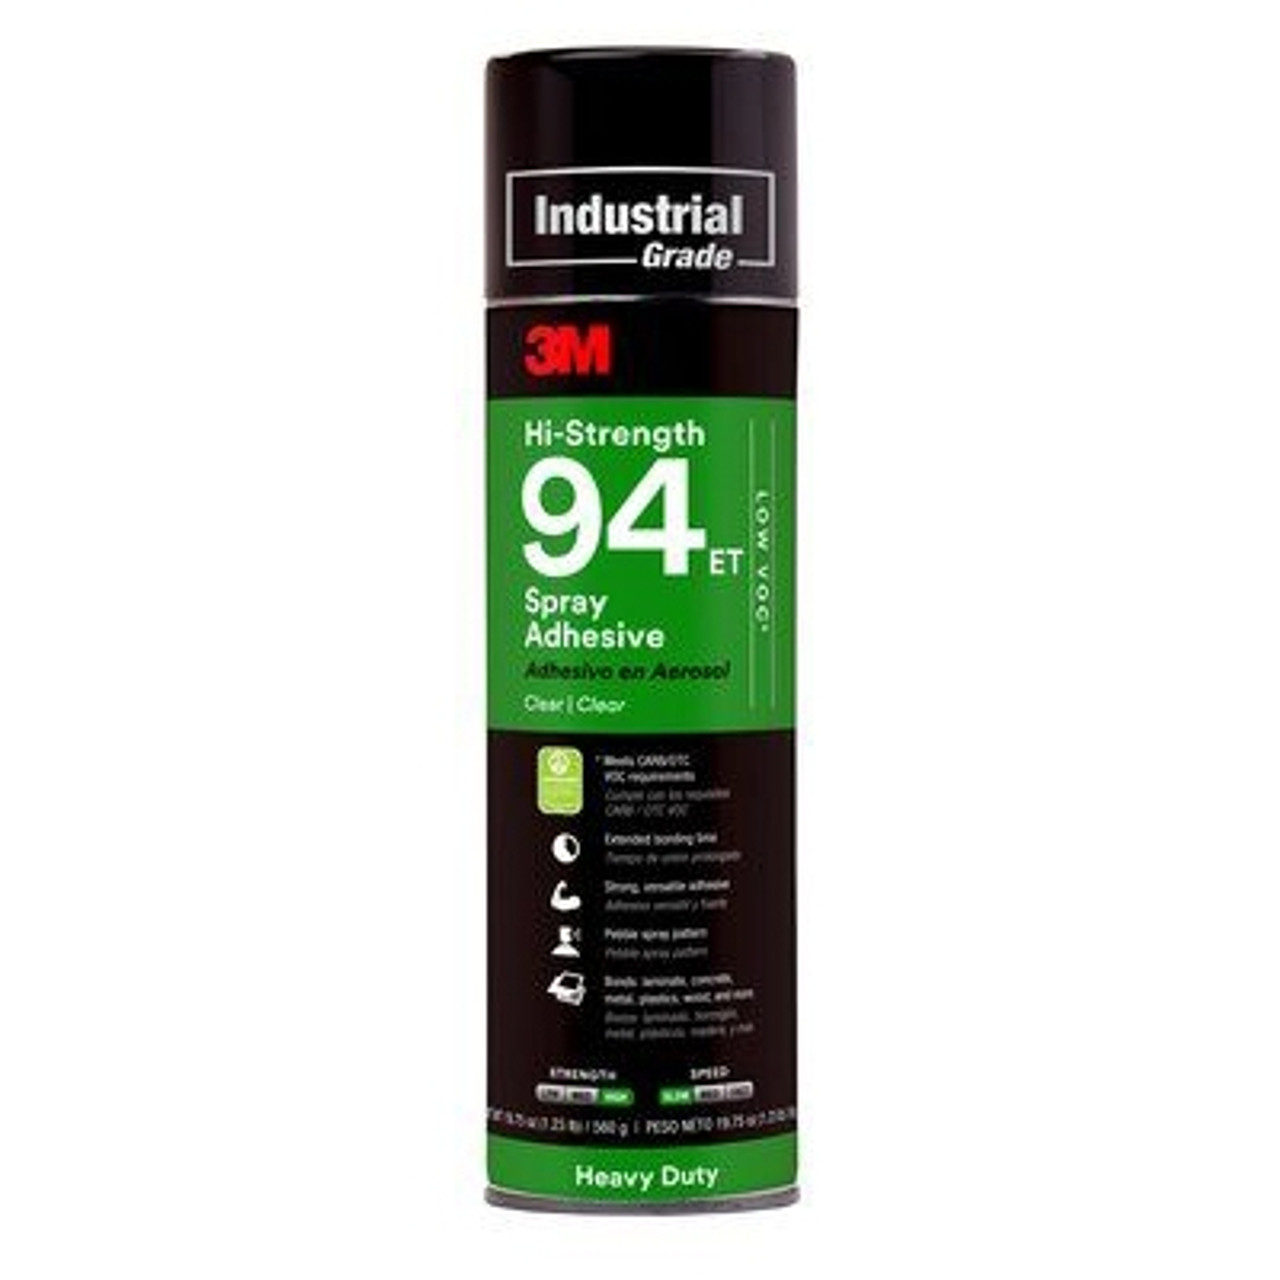 3M™ High Strength 94 Low VOC Spray Adhesive